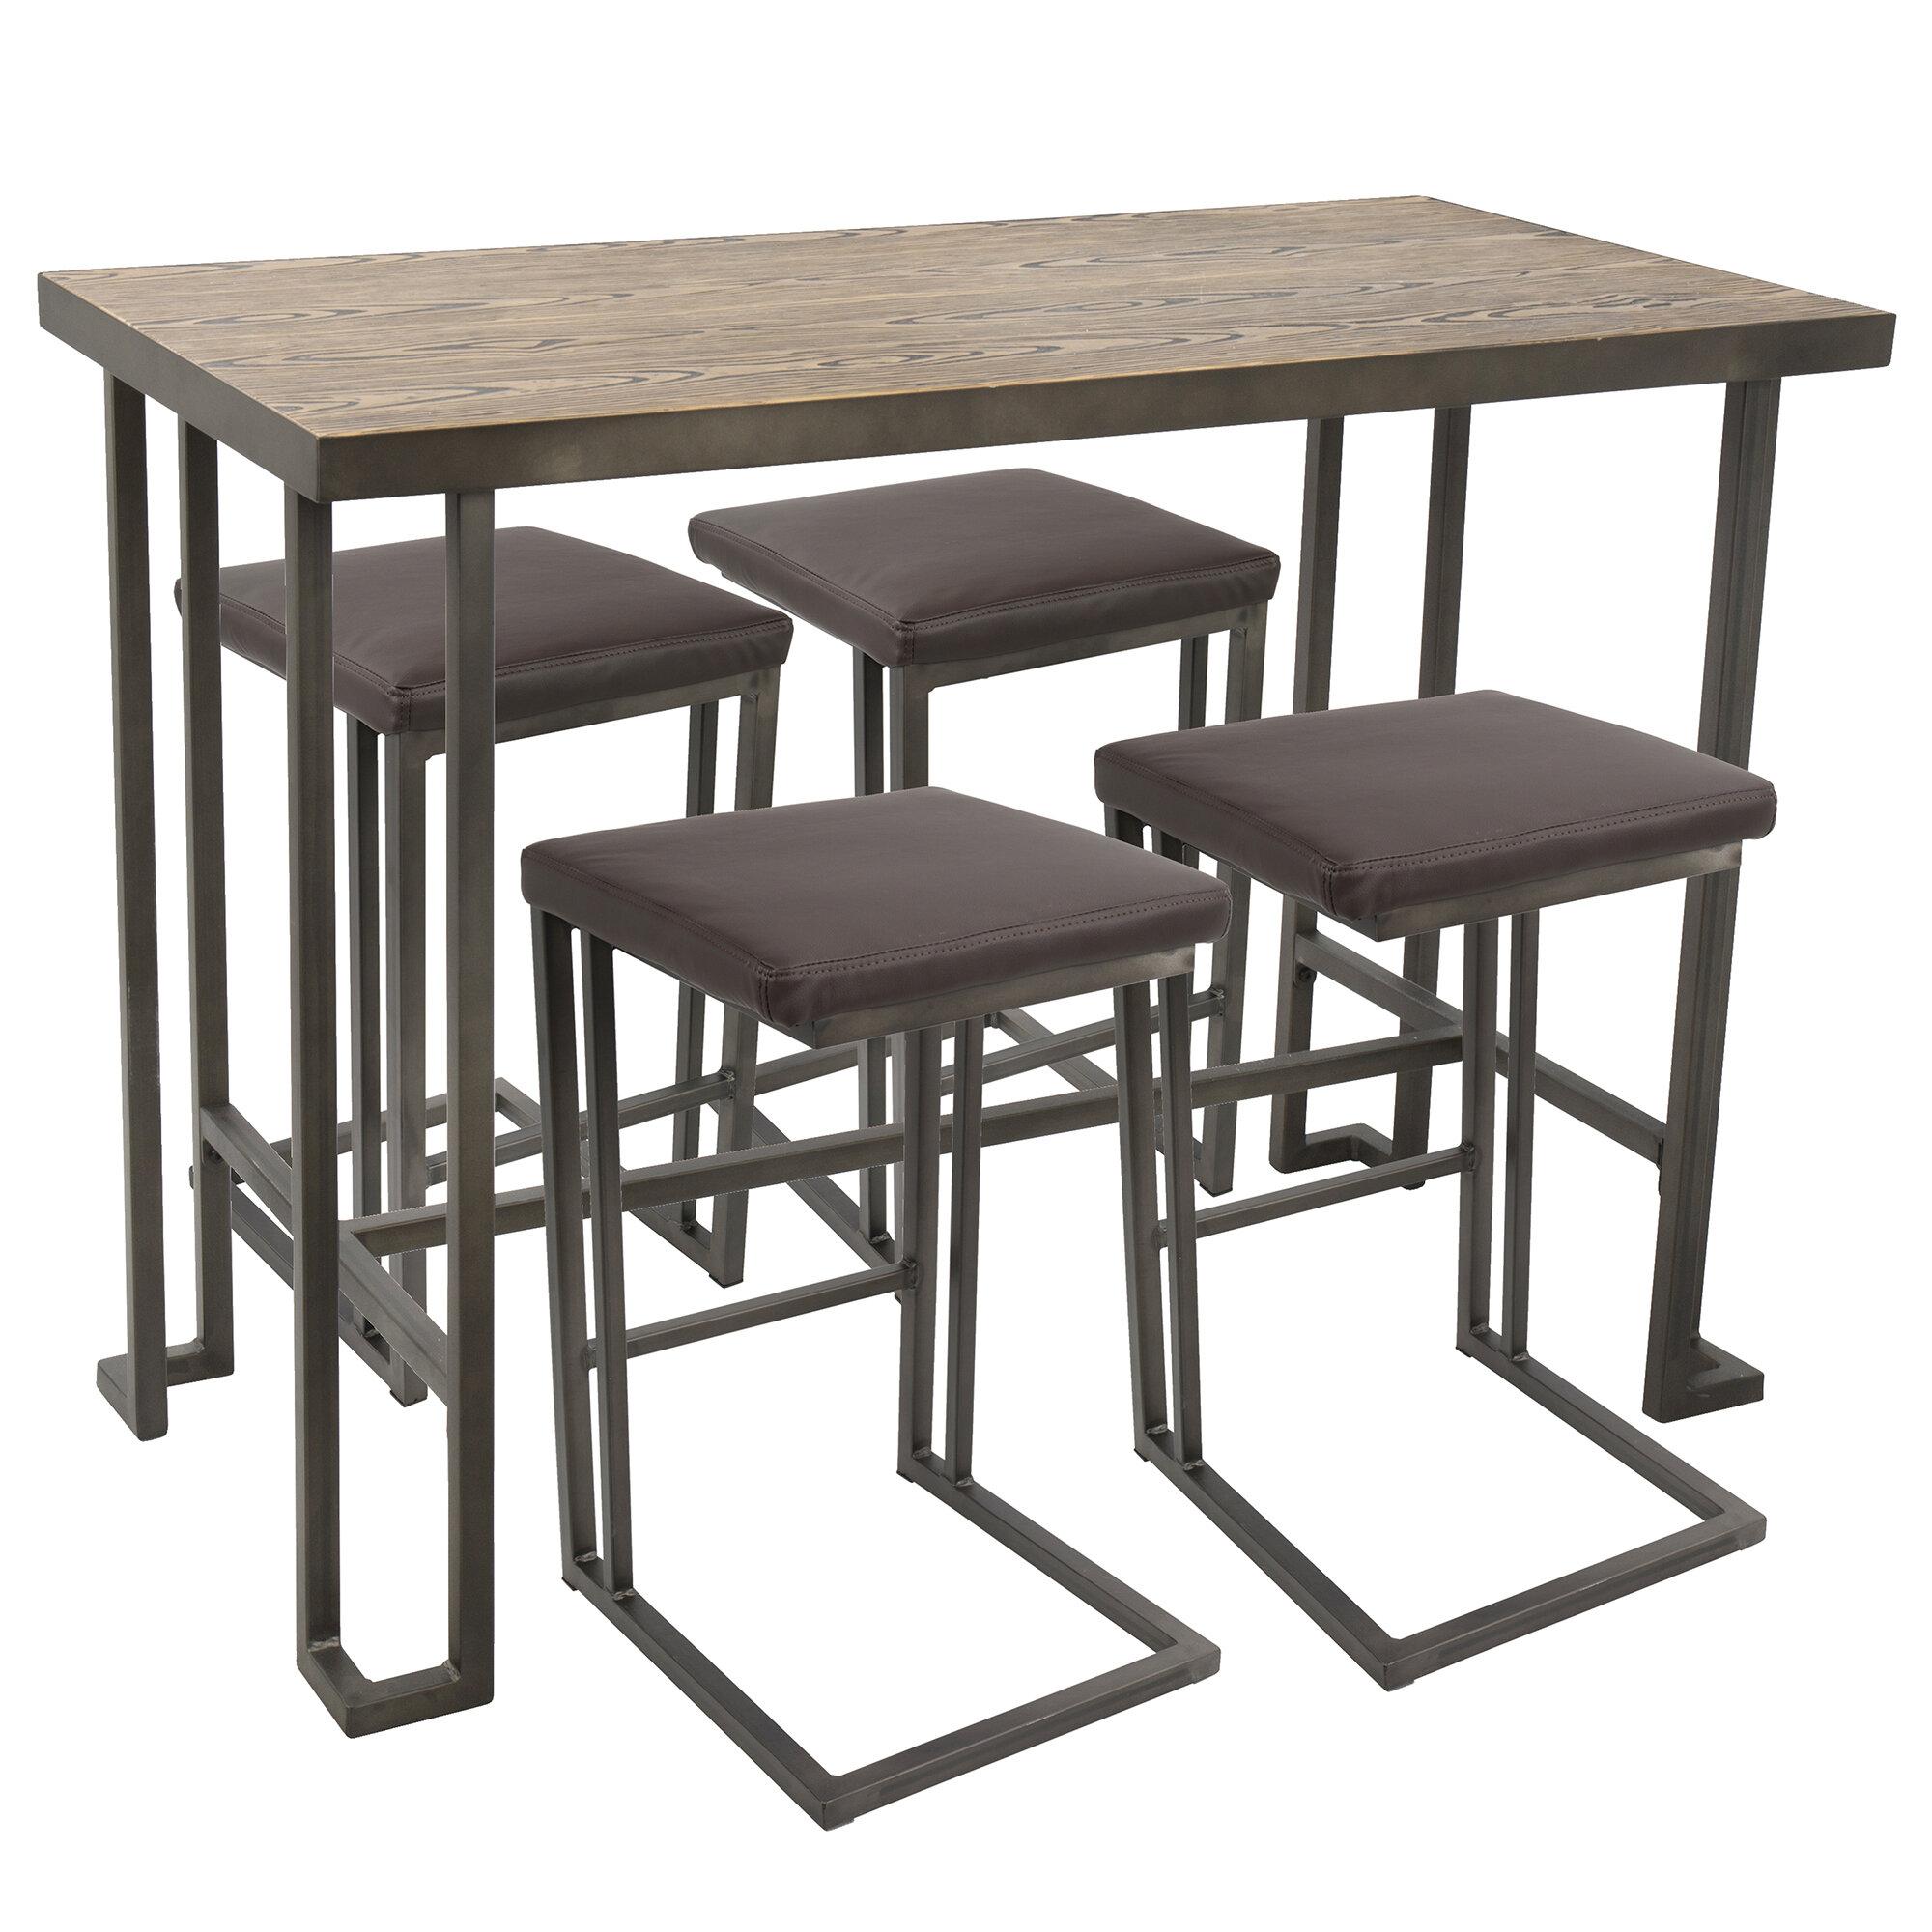 Groovy Calistoga 5 Piece Counter Height Pub Table Set Machost Co Dining Chair Design Ideas Machostcouk